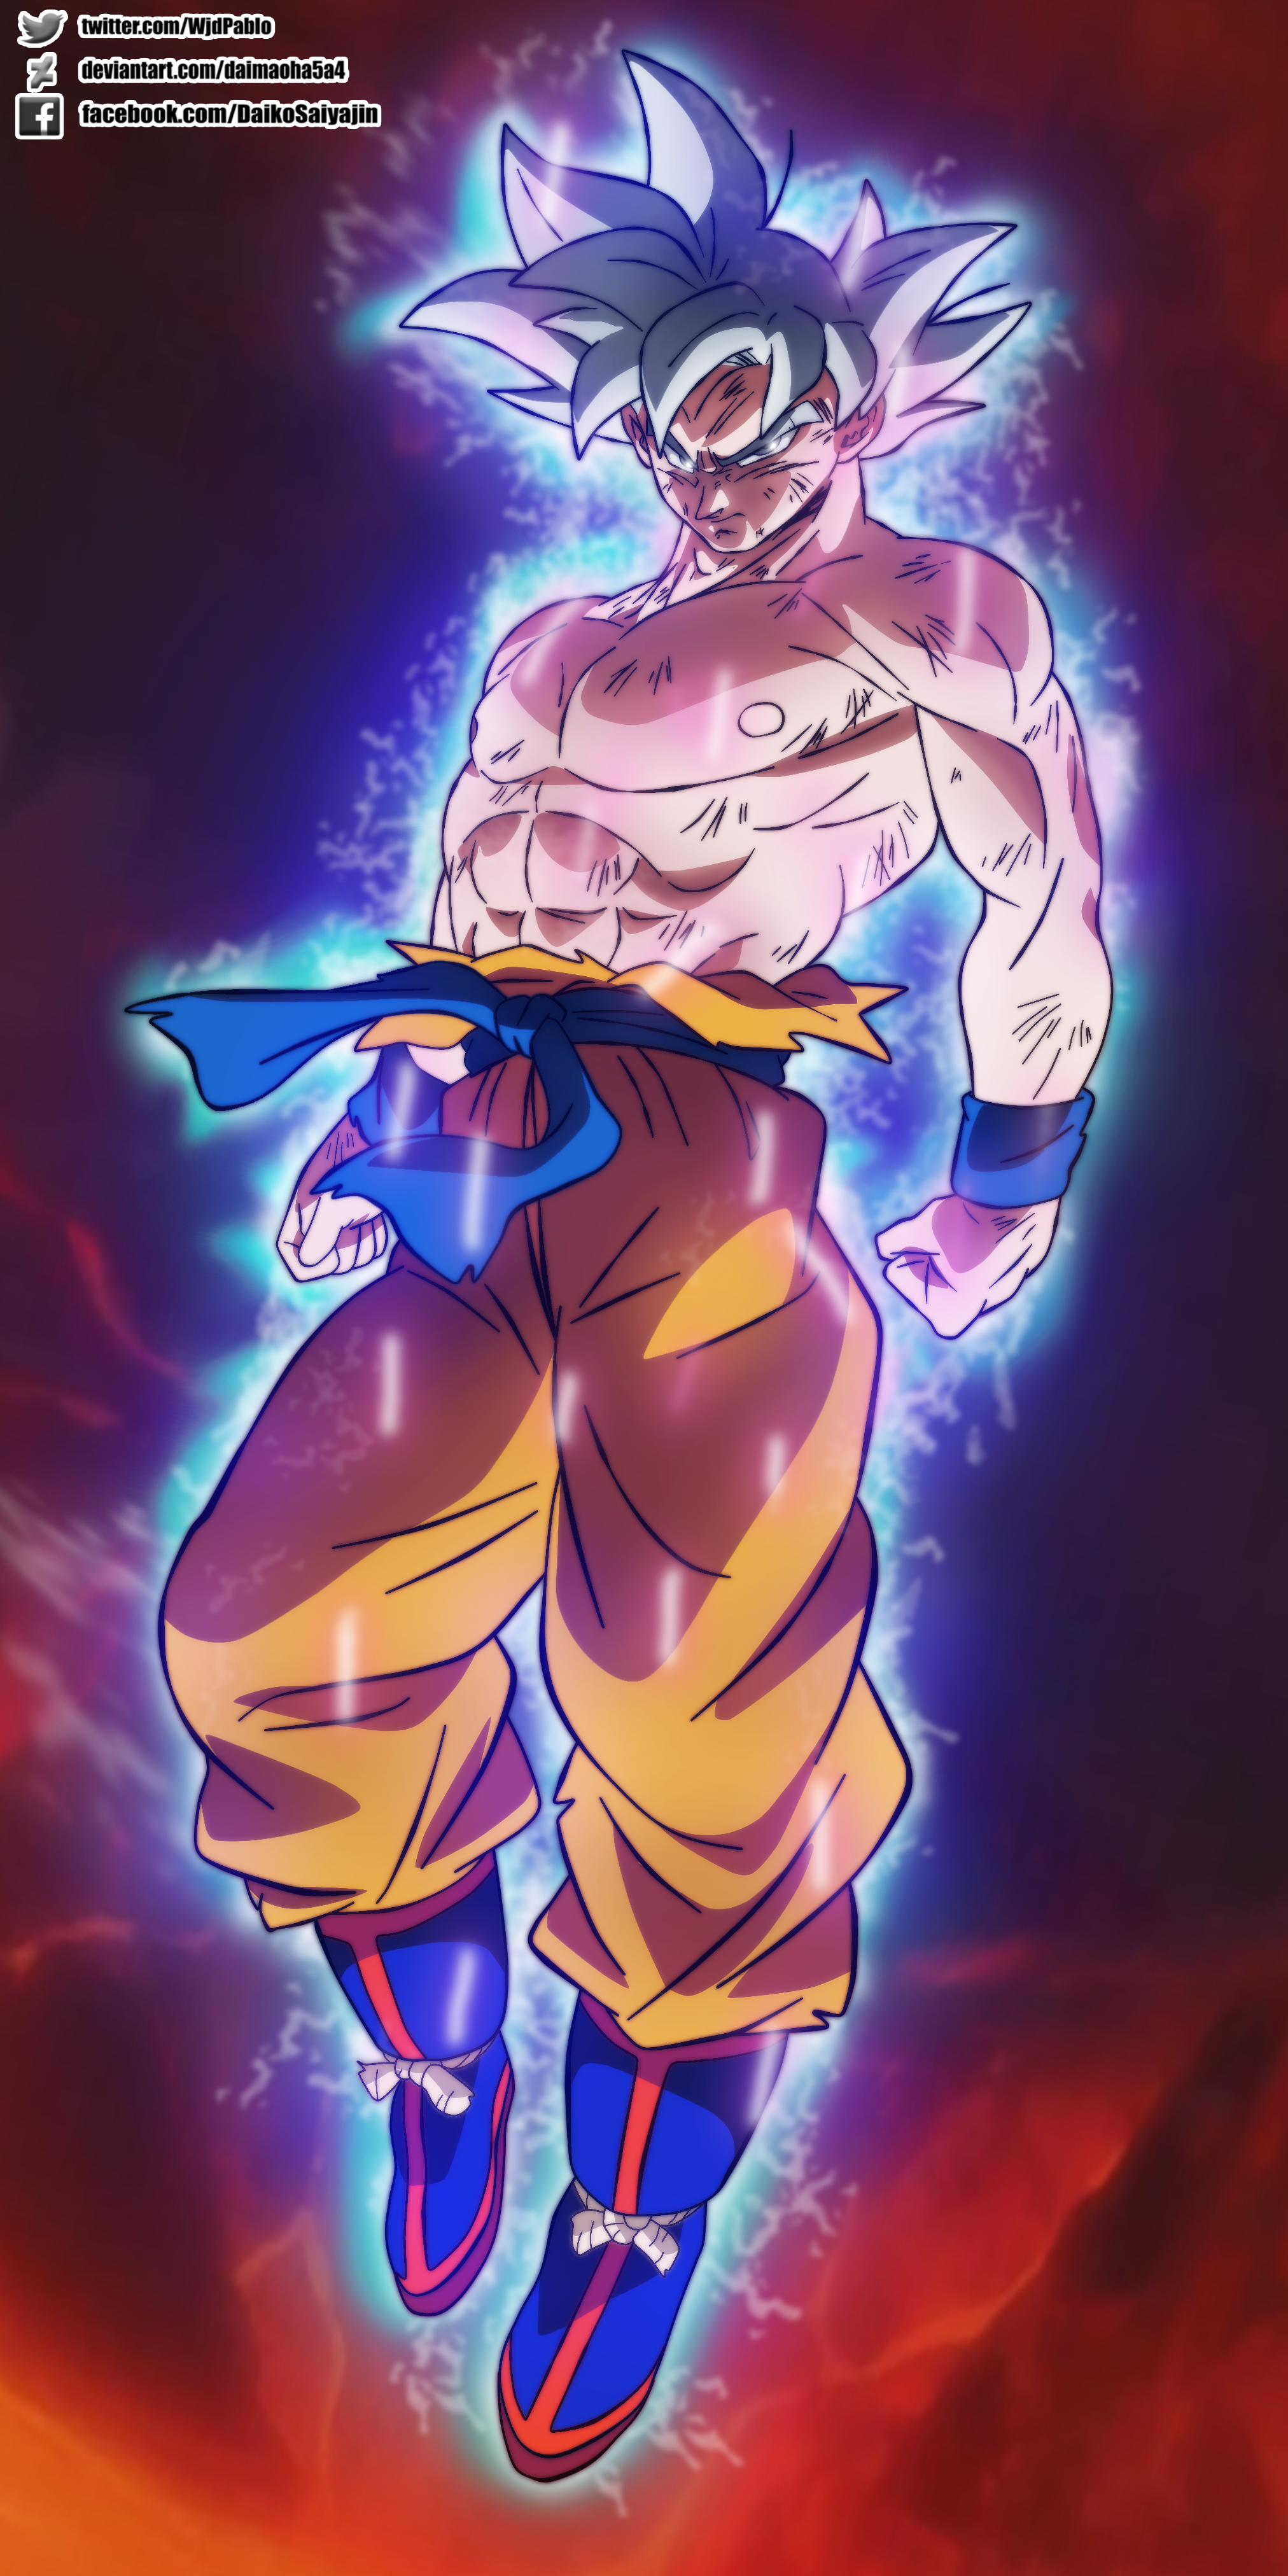 Goku Mastered Ultra Instinct In Broly Movie By Daimaoha5a4 On Deviantart Anime Dragon Ball Super Dragon Ball Super Goku Dragon Ball